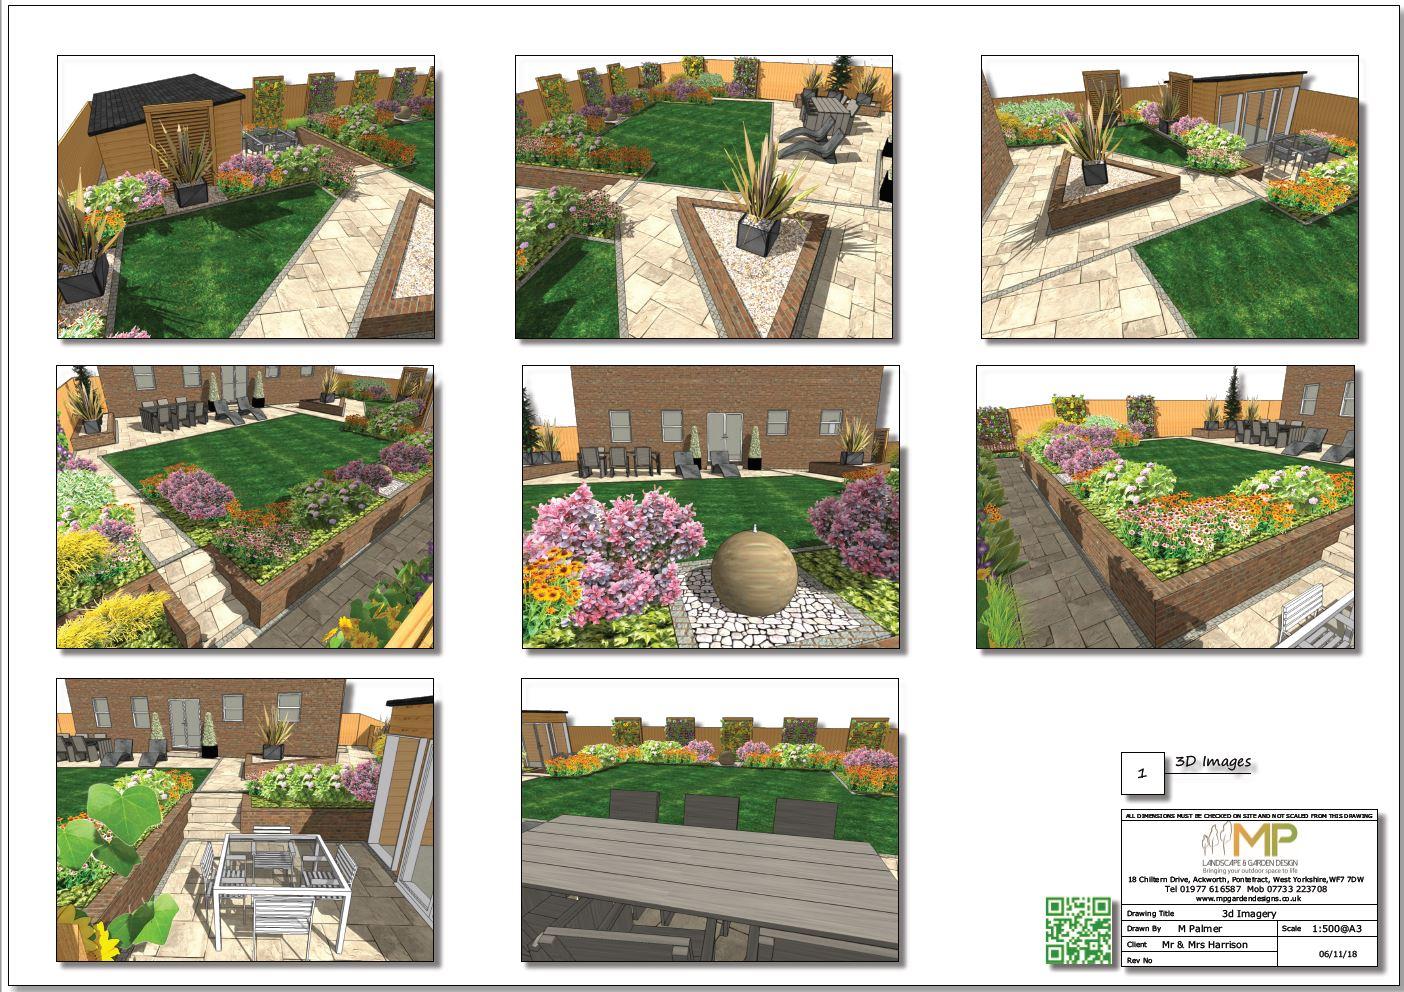 Colour 3D garden design layout plan for a rear garden in Wistow, North Yorshire.